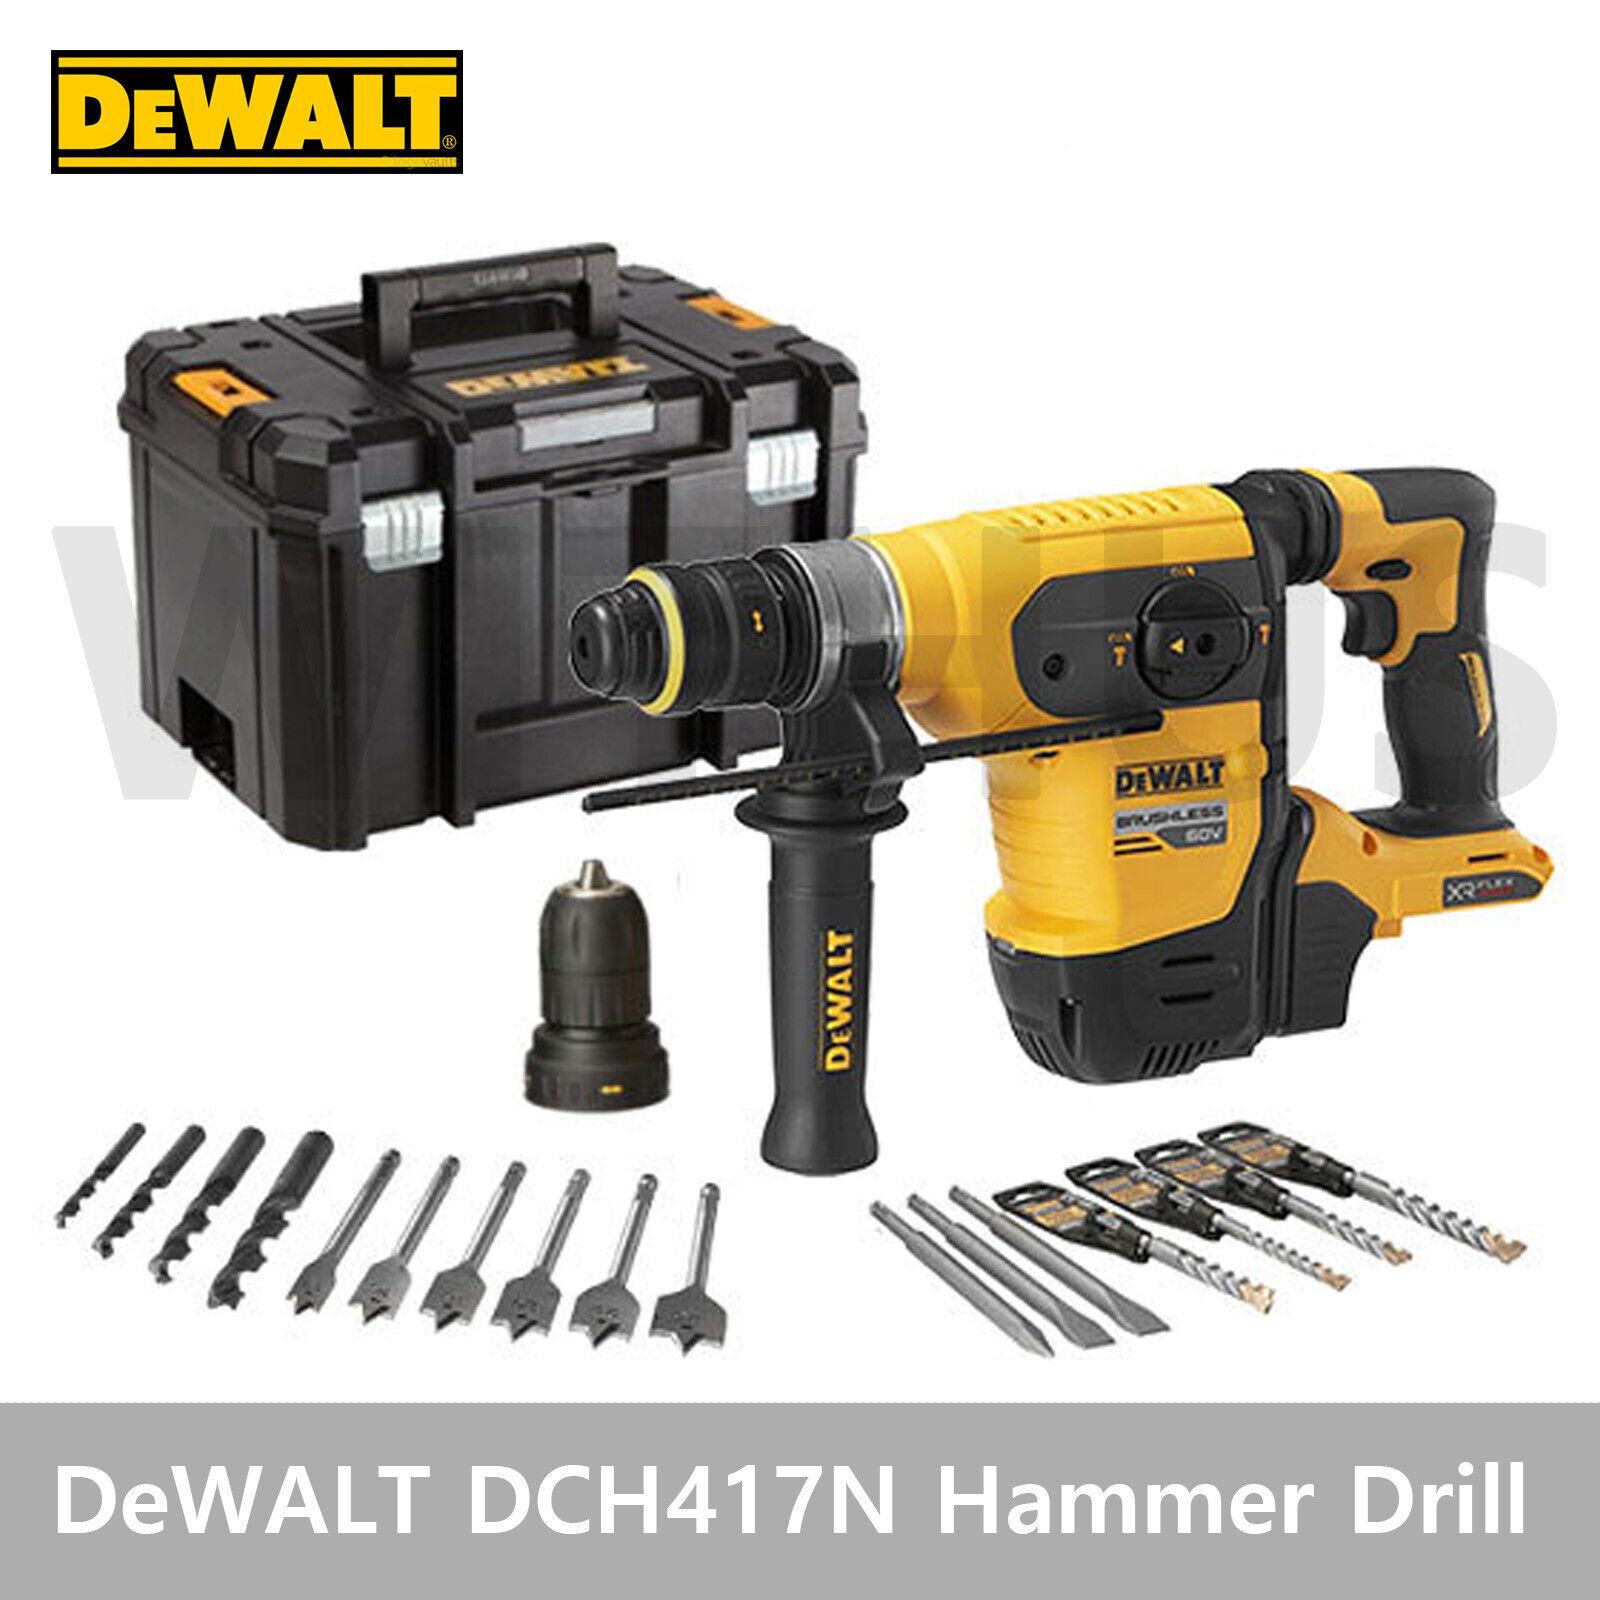 DeWALT DCH417N 60V Max Flexvolt XR Brushless SDS Plus Hammer Drill Bare Tool